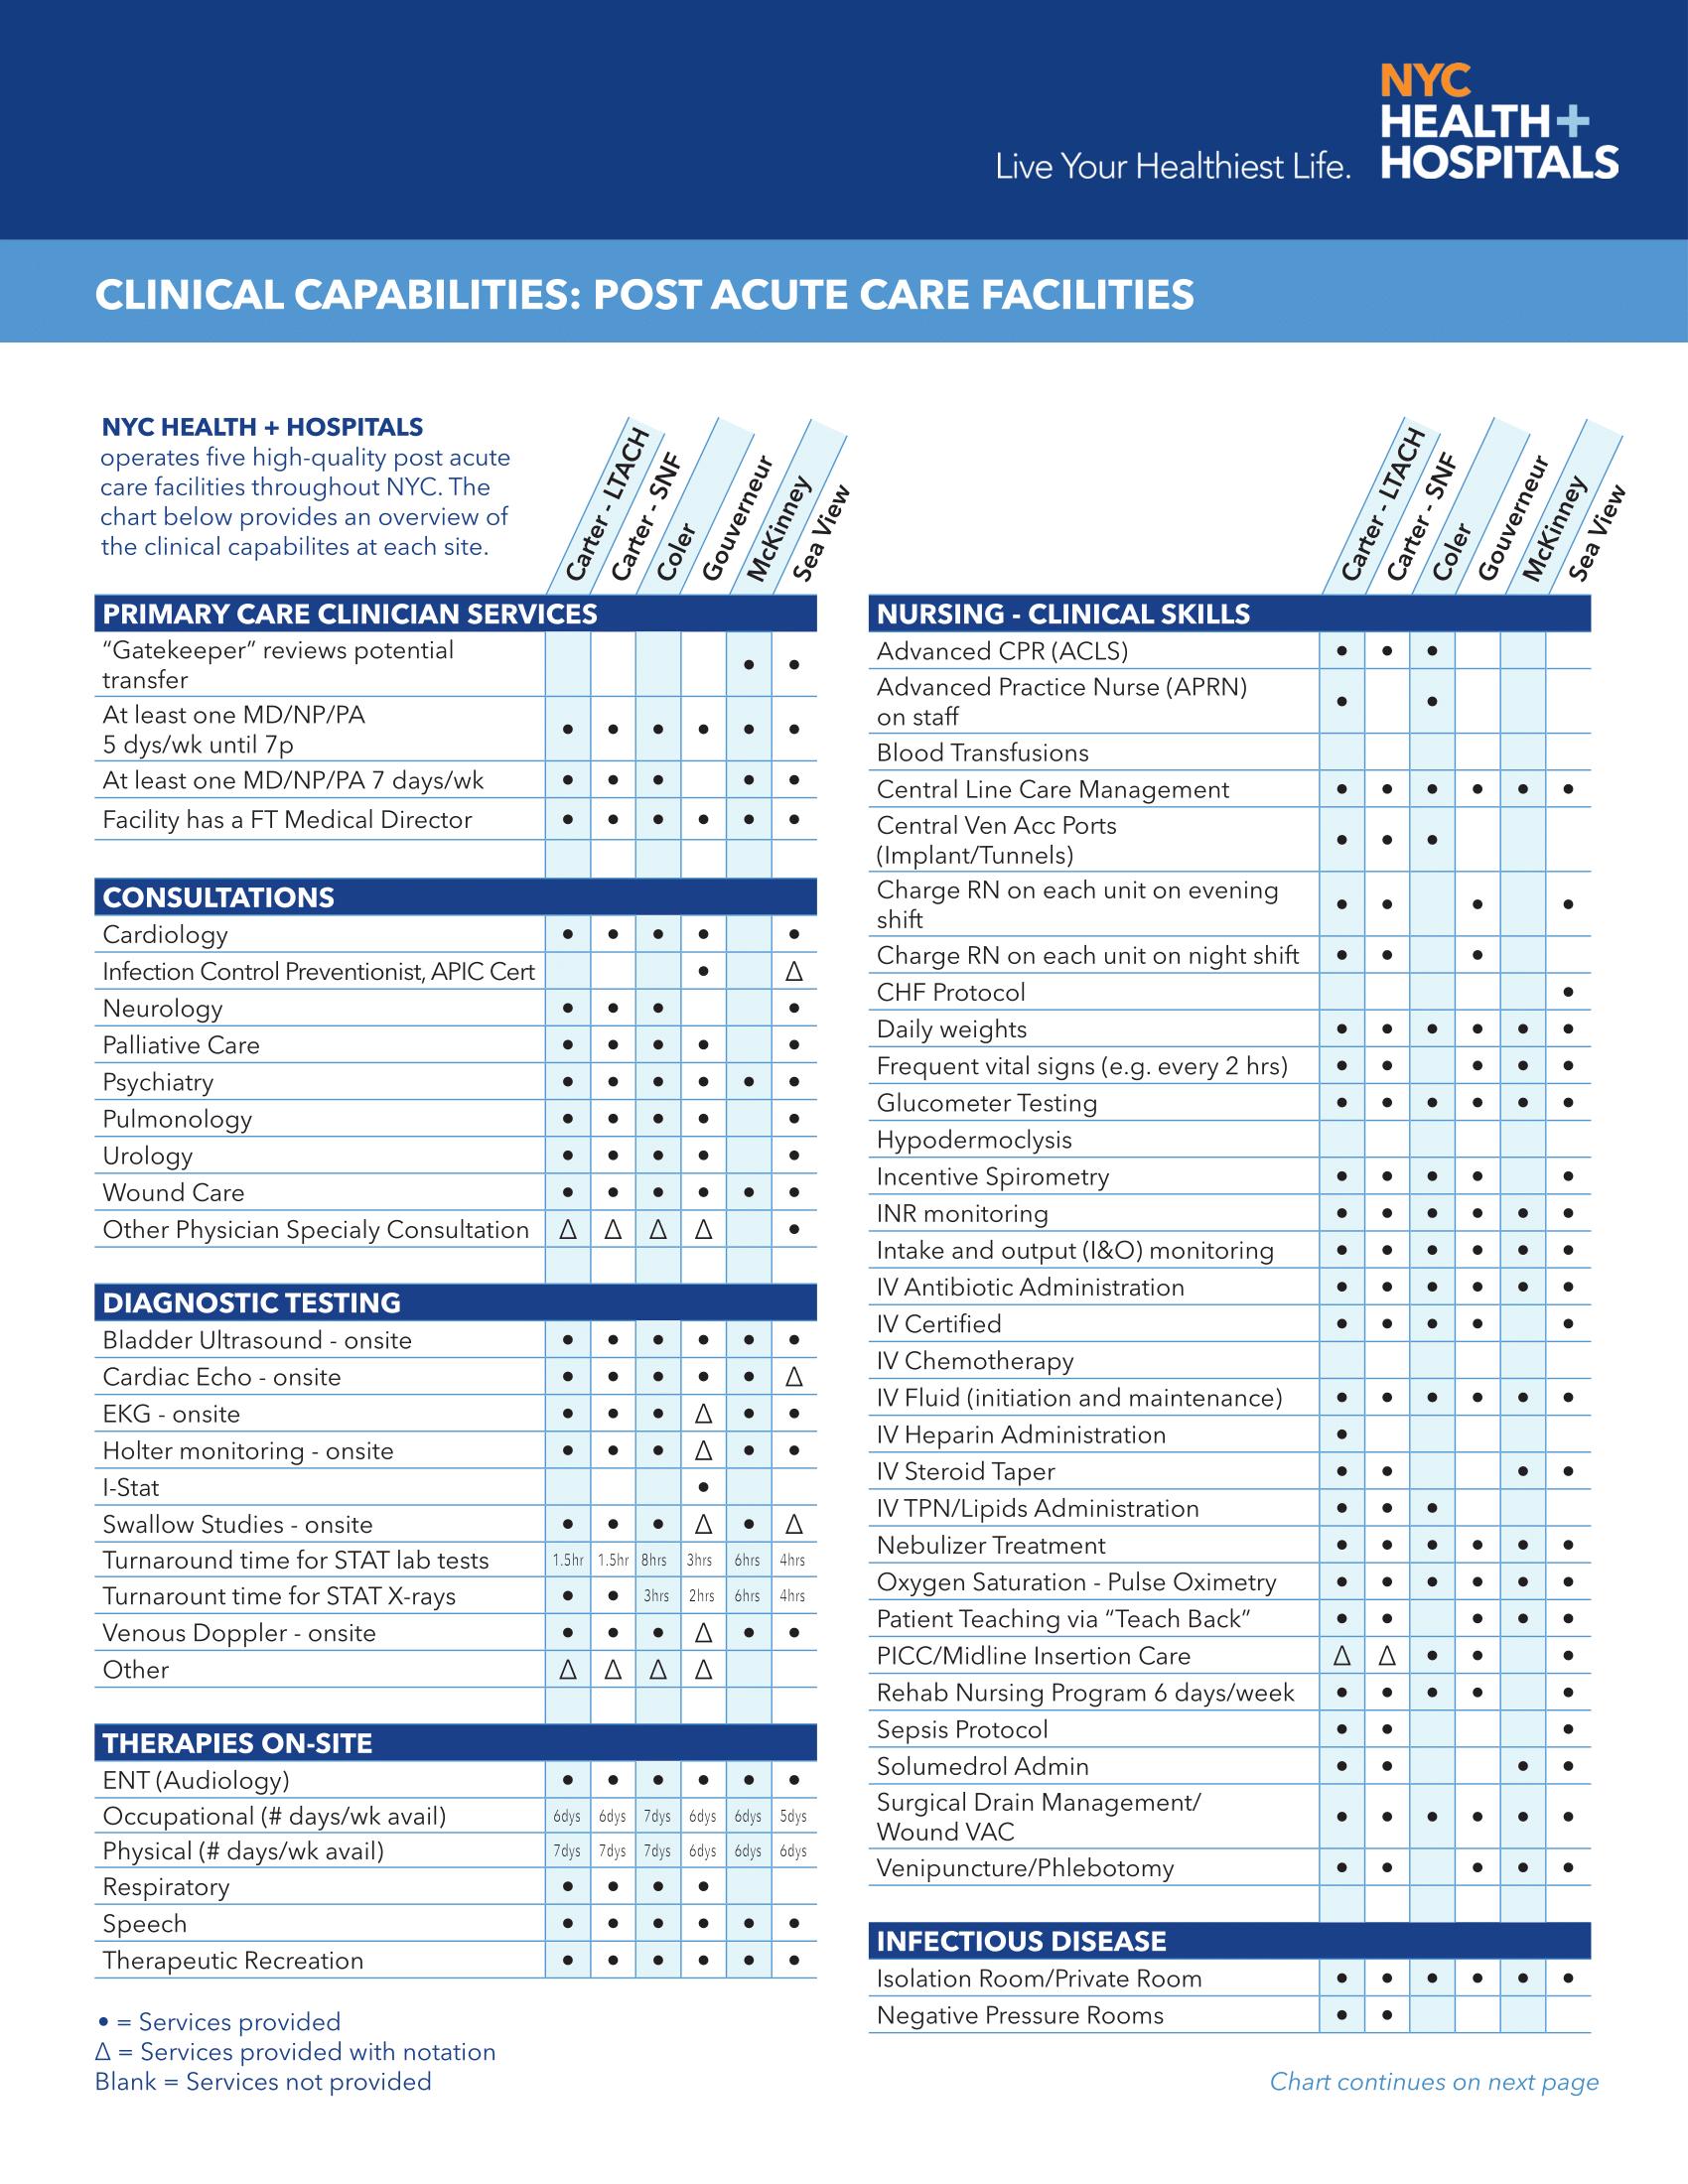 LTC_Capabilities_Chart-1.png